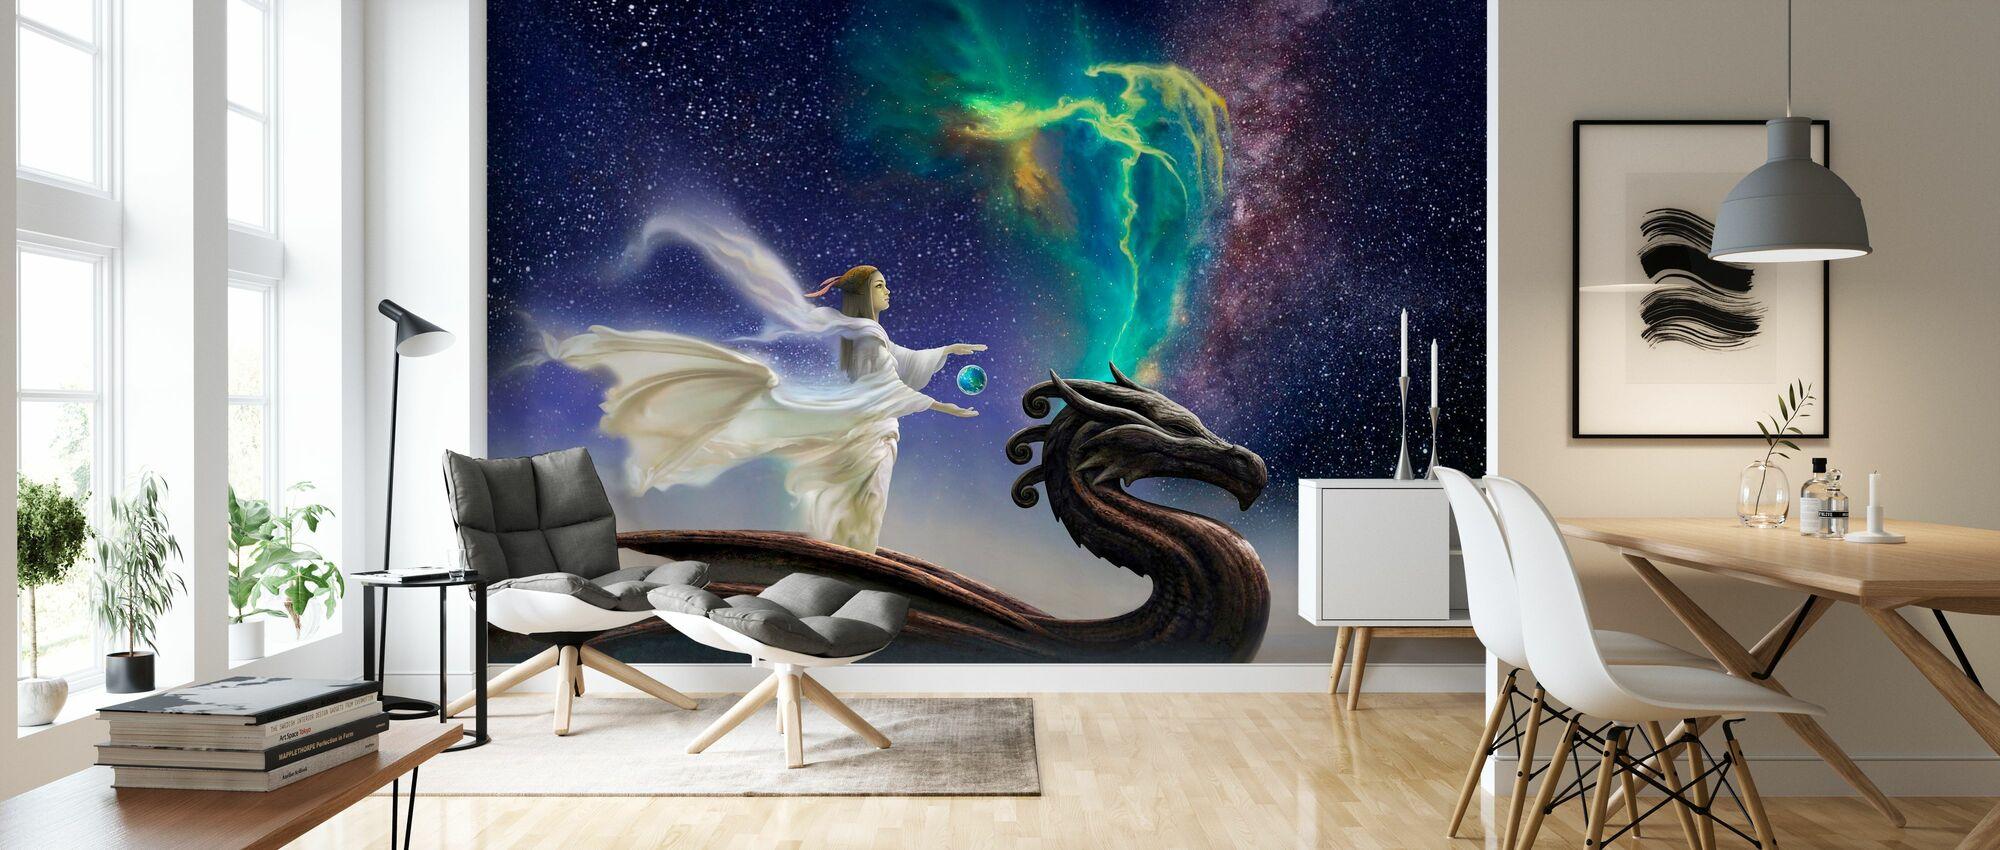 Cosmic - Wallpaper - Living Room